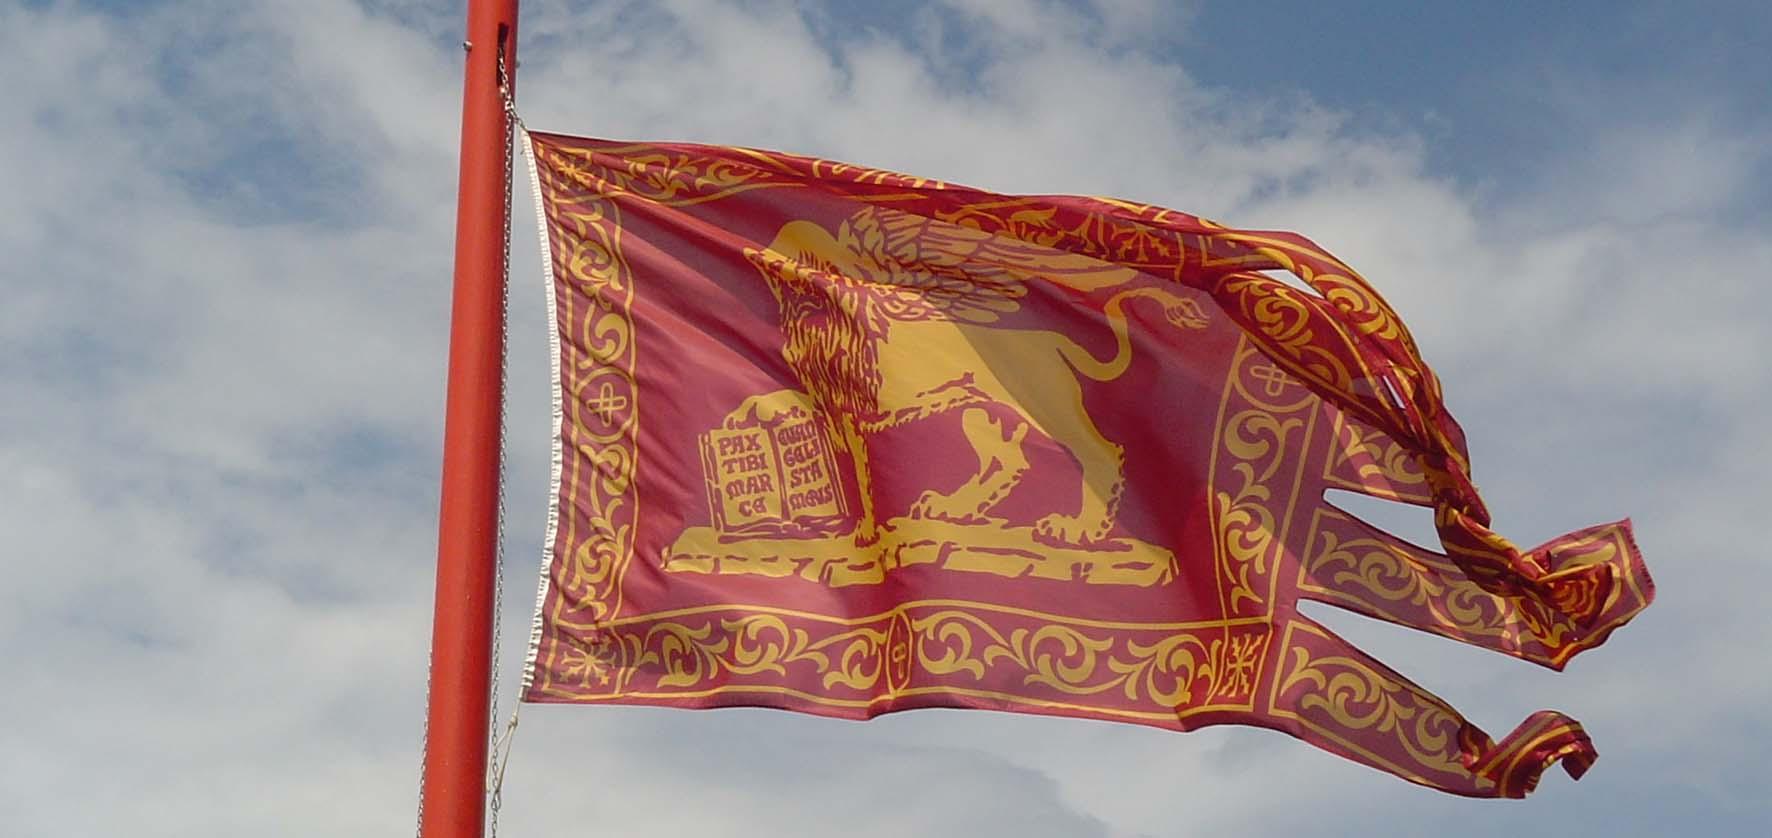 bandiera gonfalone veneto san marco leone